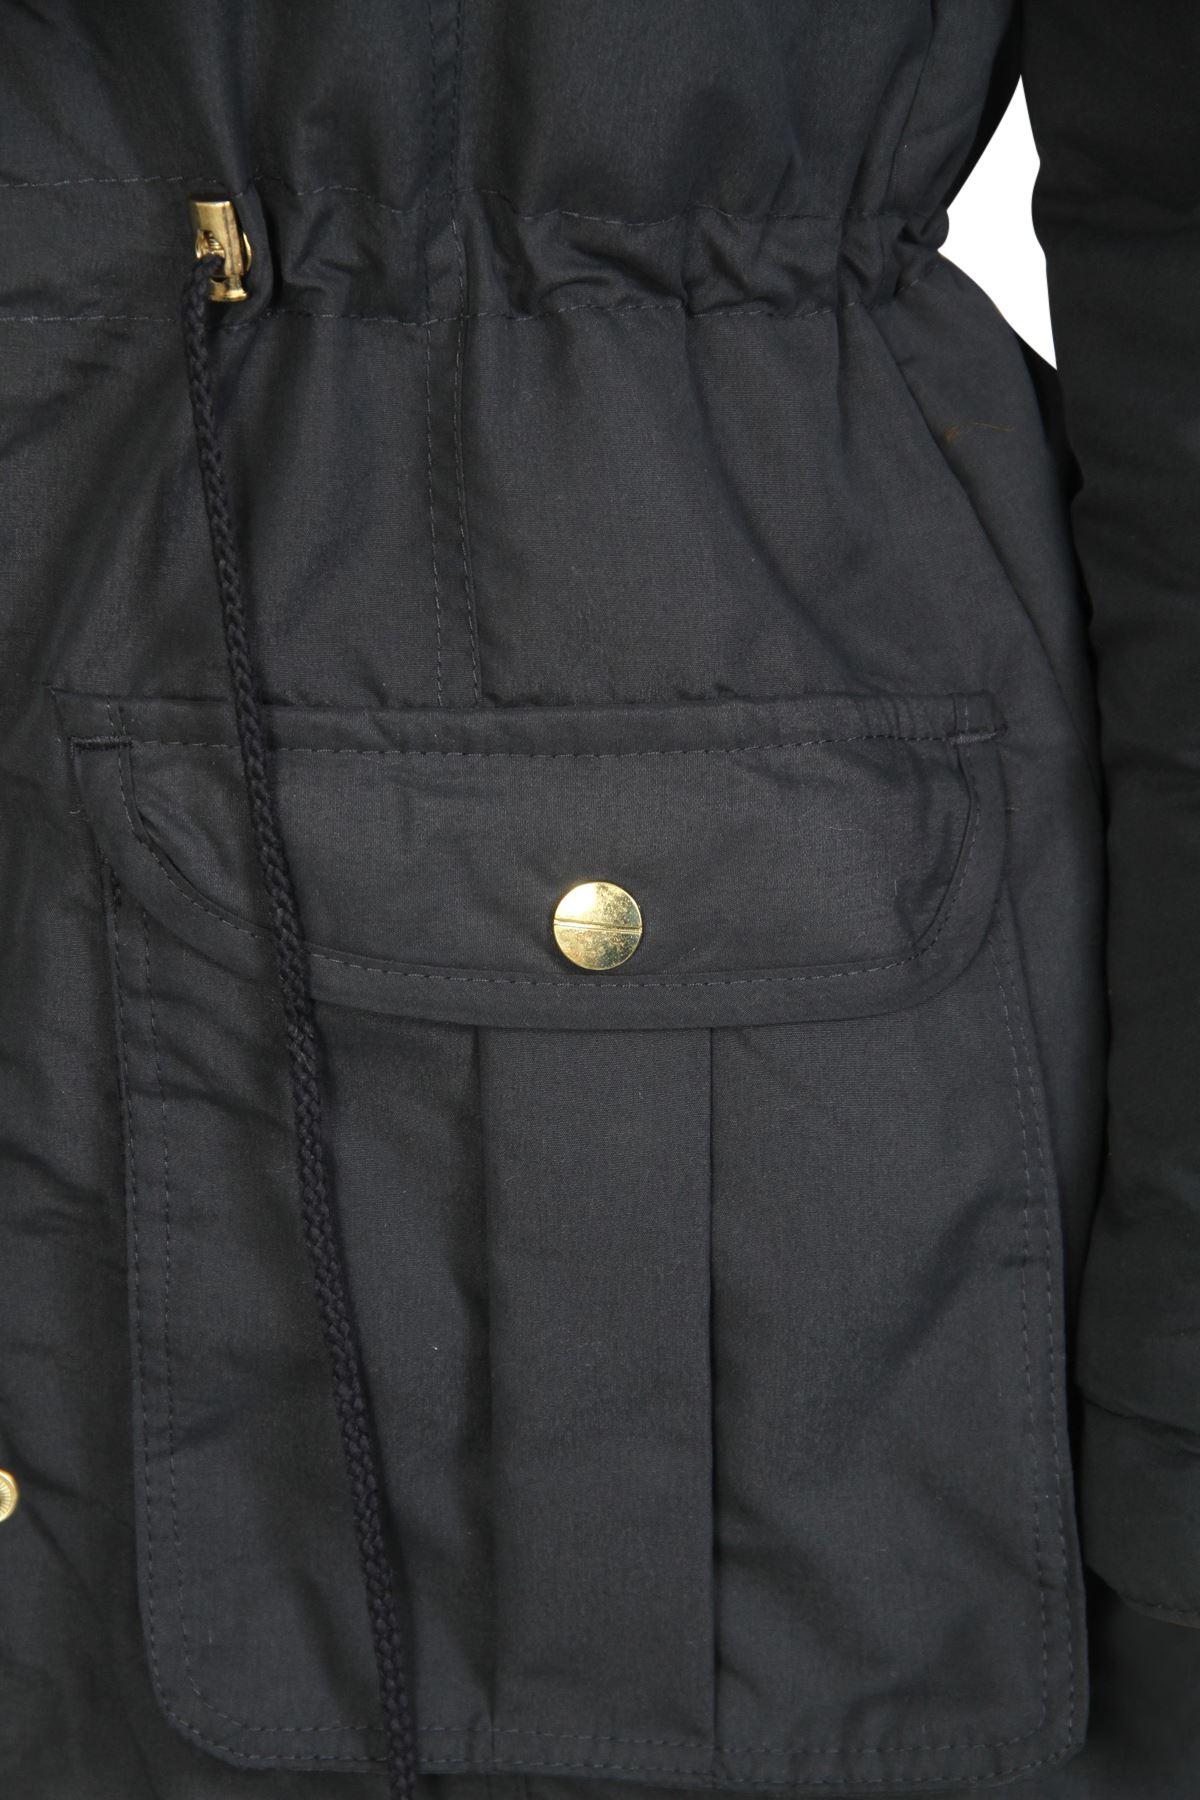 Womens-Brave-Soul-Plain-Trimmed-Parka-Faux-Fur-Hooded-Winter-Jacket-Long-Coat thumbnail 8